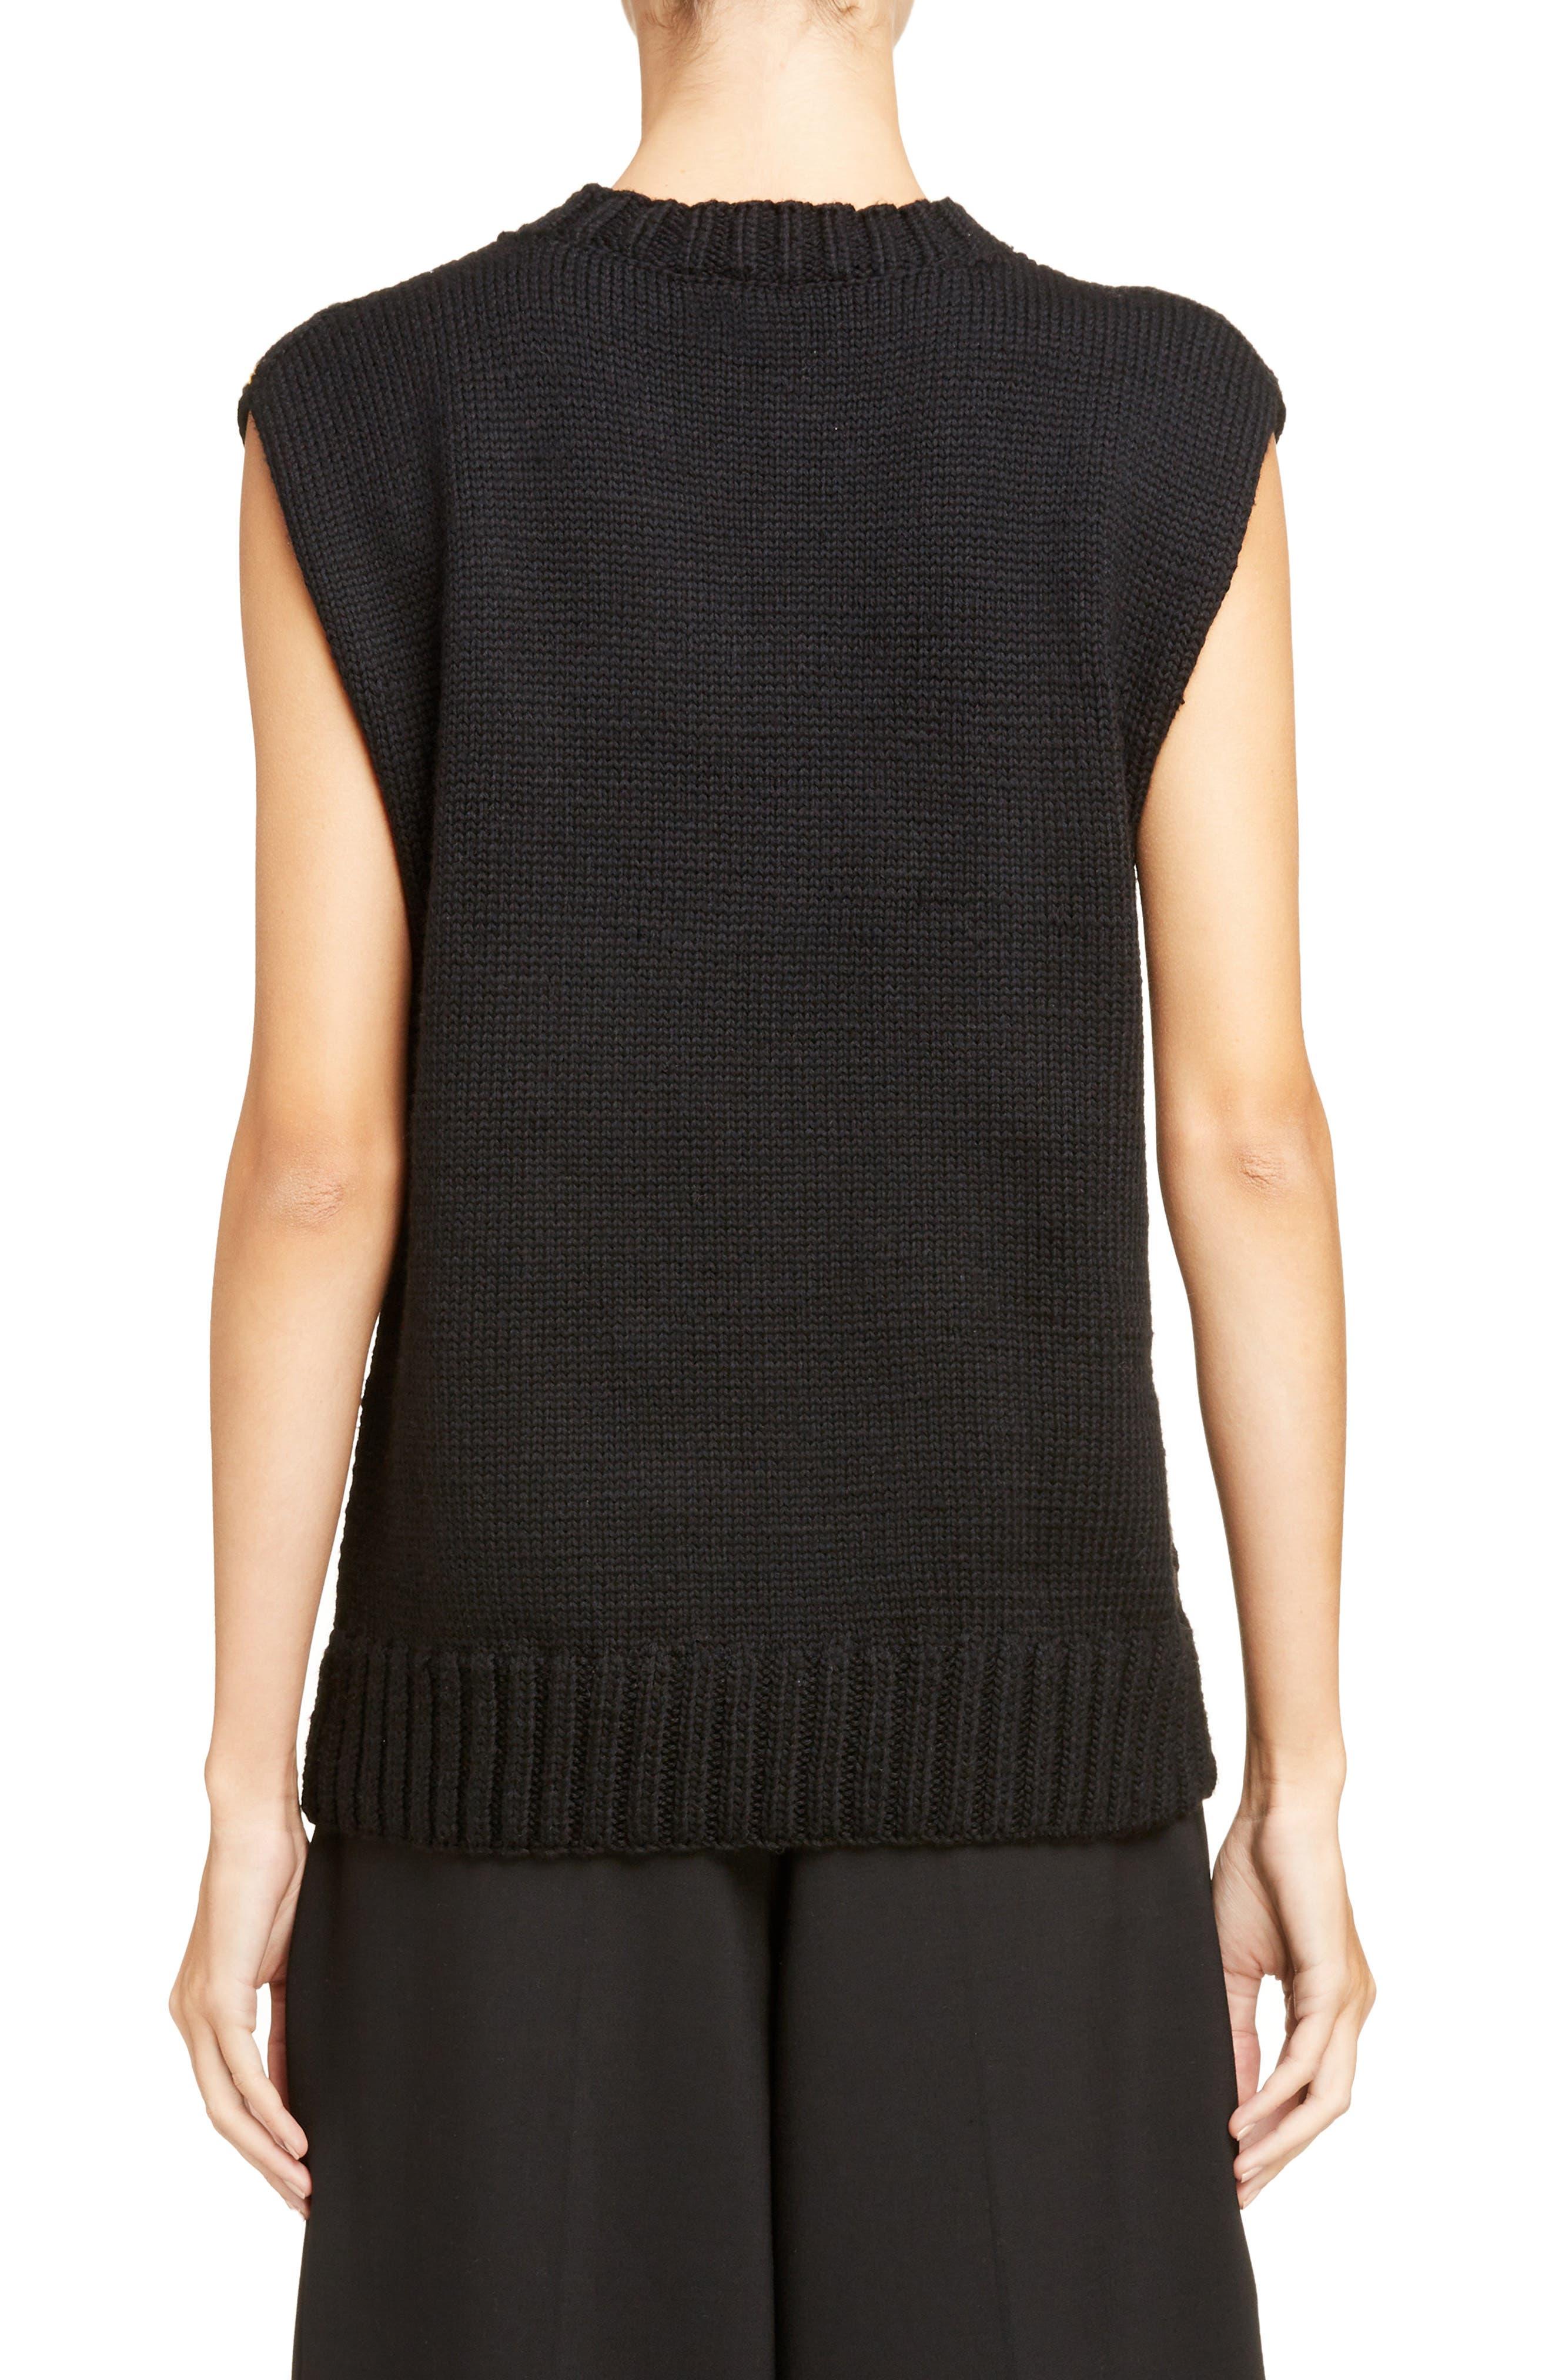 Palm Lady Sweater Tank,                             Alternate thumbnail 2, color,                             Black